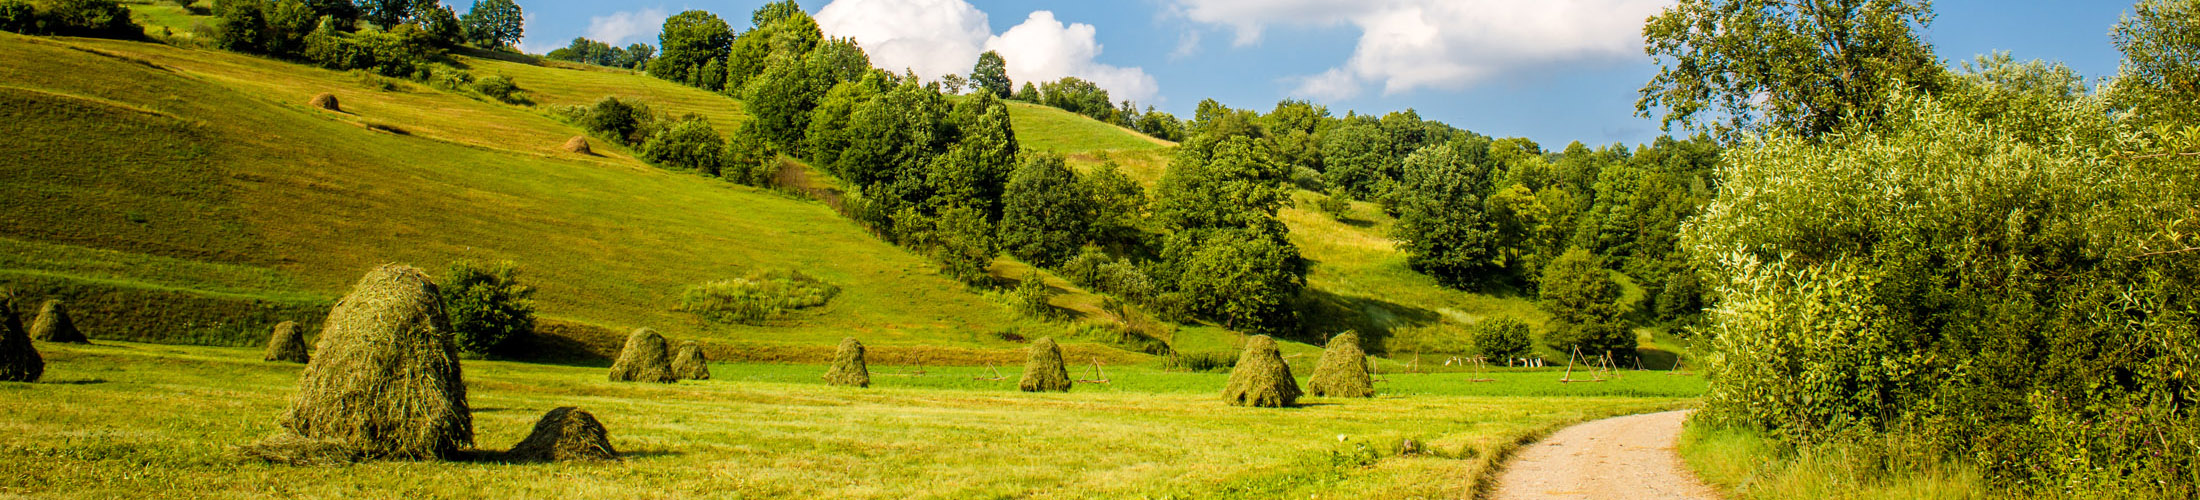 Transylvanian Hills, Romania